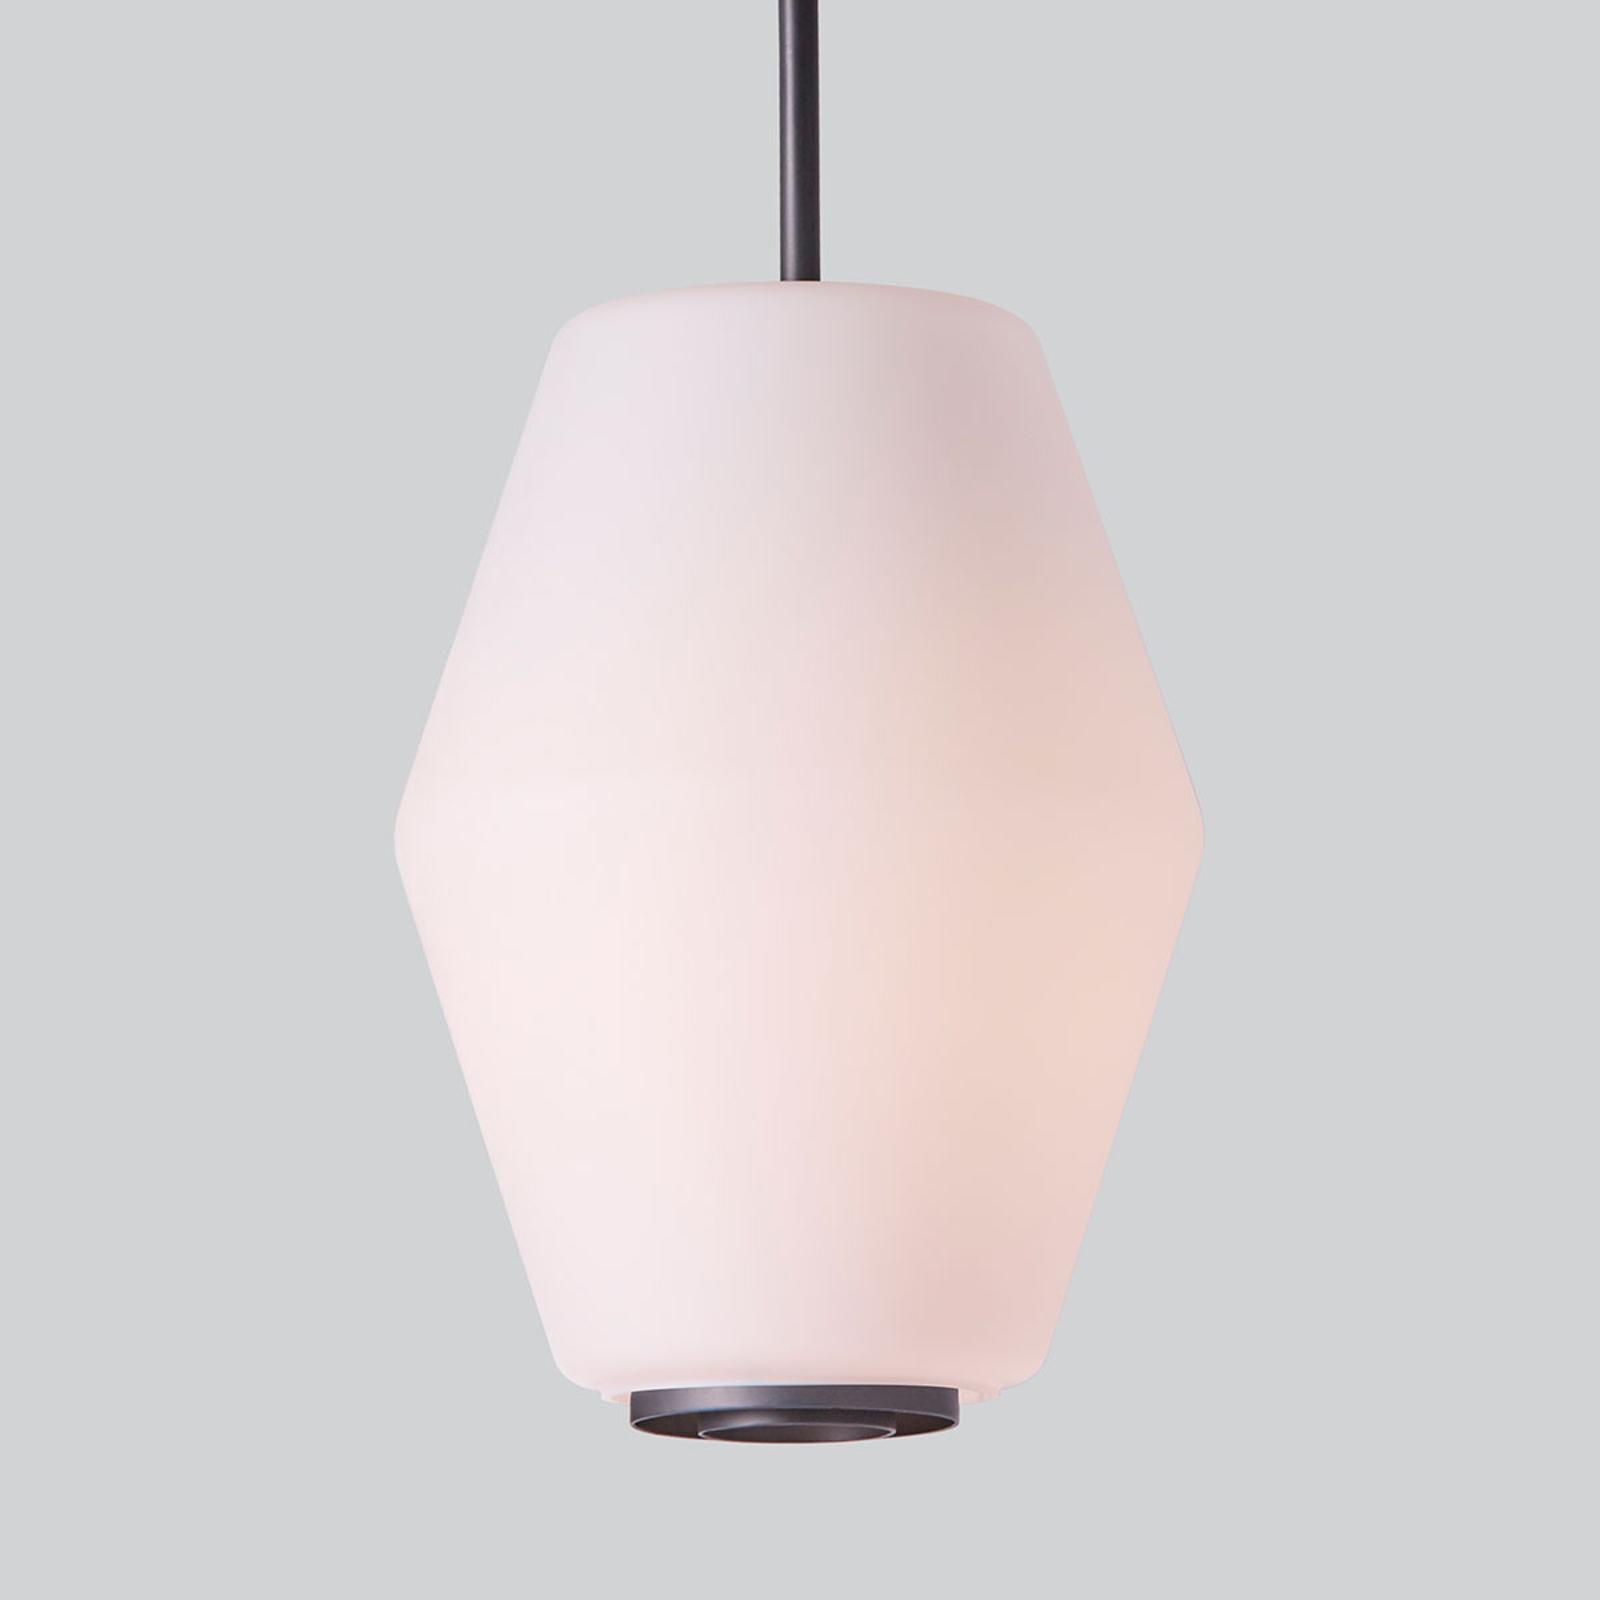 Northern Dahl hanglamp donkergrijs